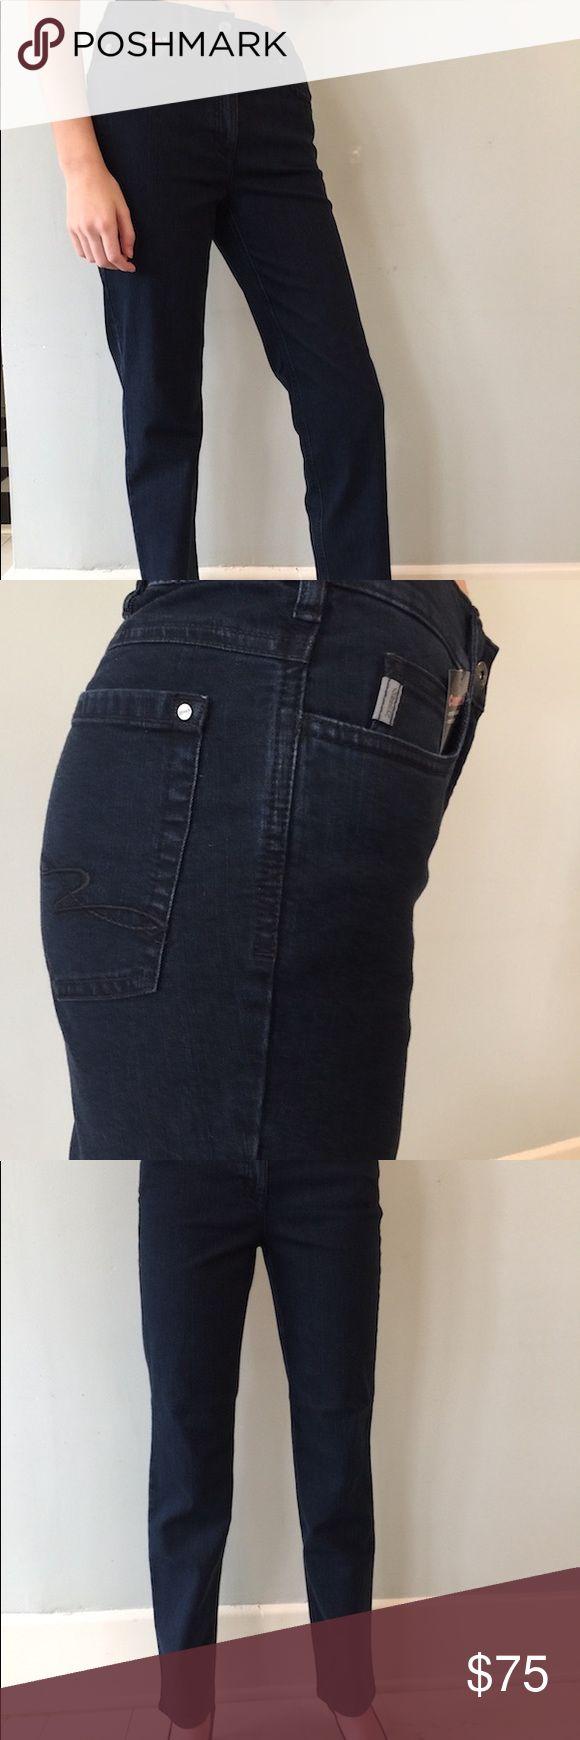 "Zerres Women's Jeans in Dark Blue Greta style Zerres Women's Jeans in Dark Blue.  Straight leg with 31"" inseam.  Comfort waist with elastic band just at sides. Zerres Jeans Straight Leg"